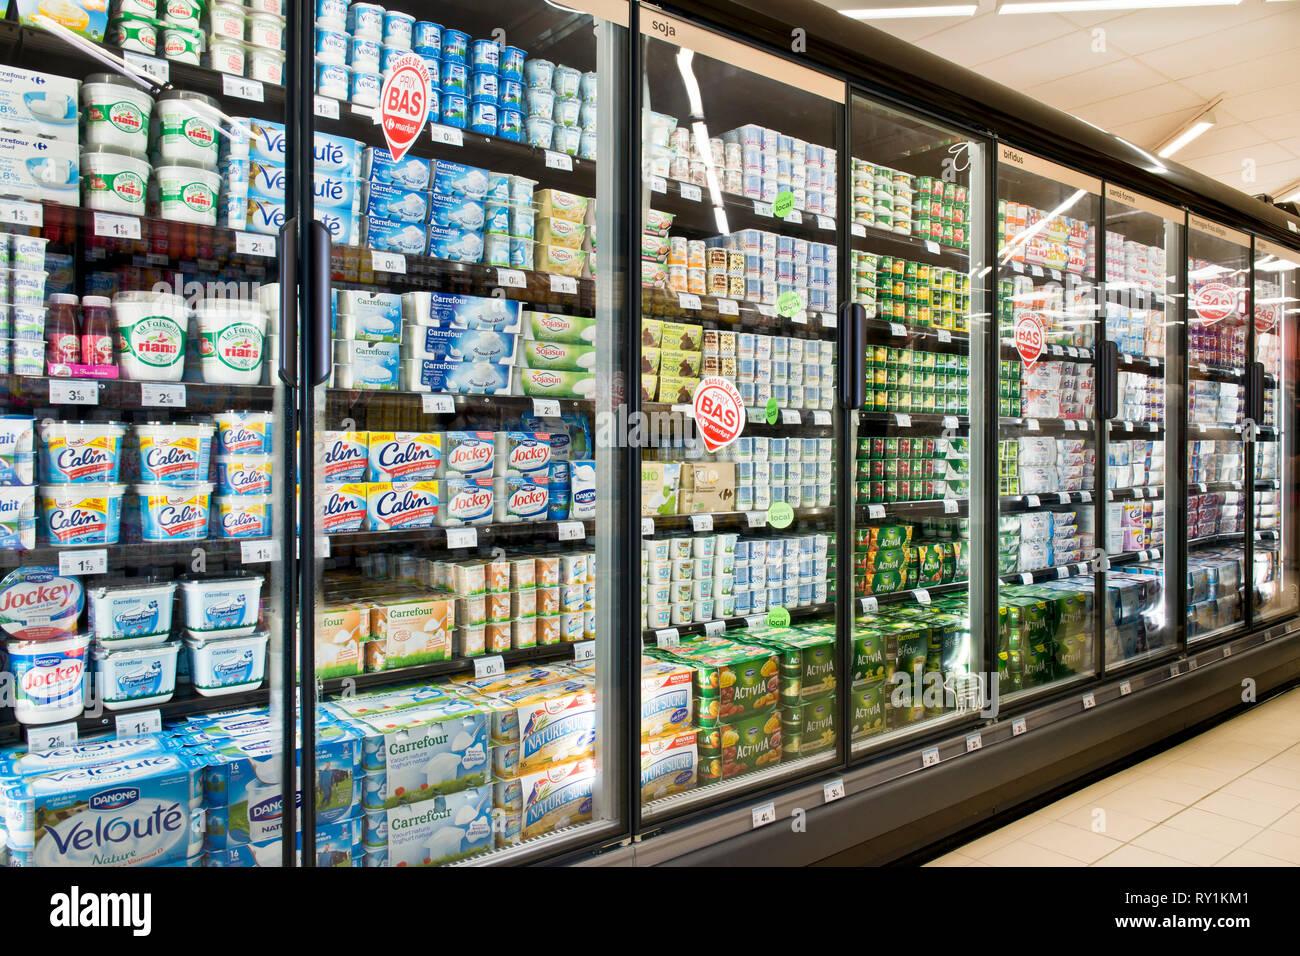 24e41fa4ecf Yoghurts Supermarket Stock Photos & Yoghurts Supermarket Stock ...